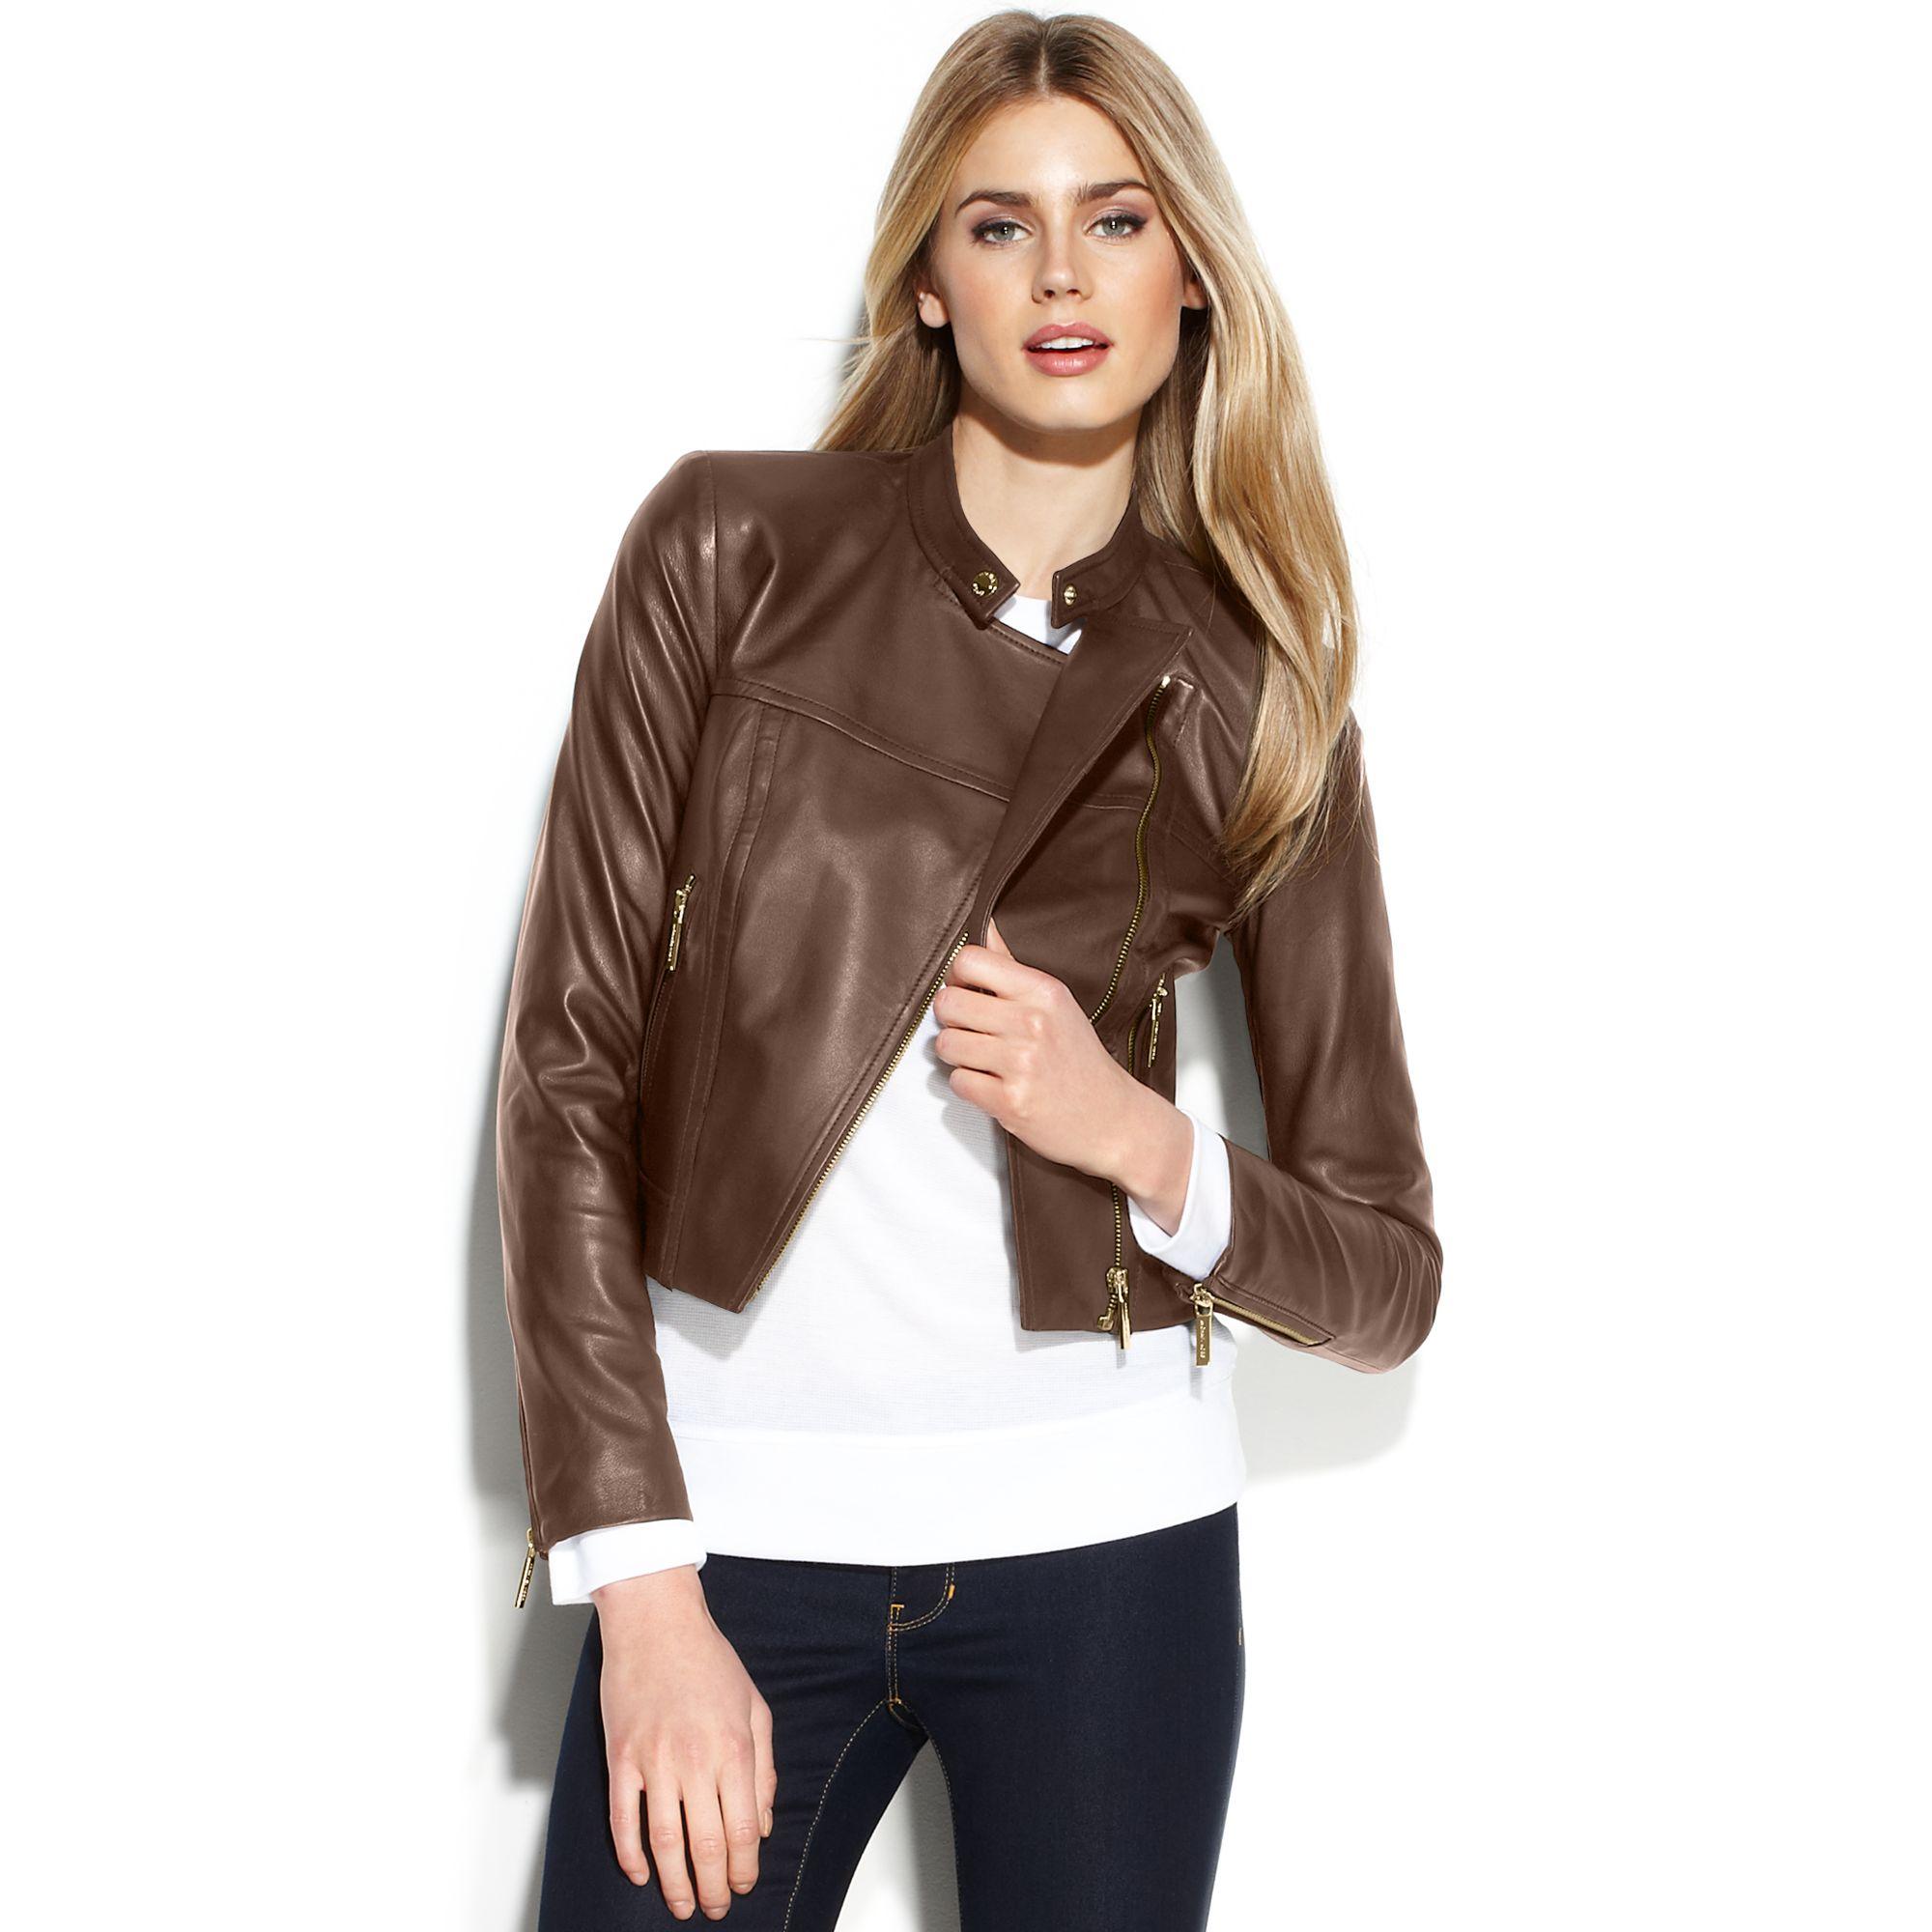 Brown Cropped Leather Jacket - Jacket